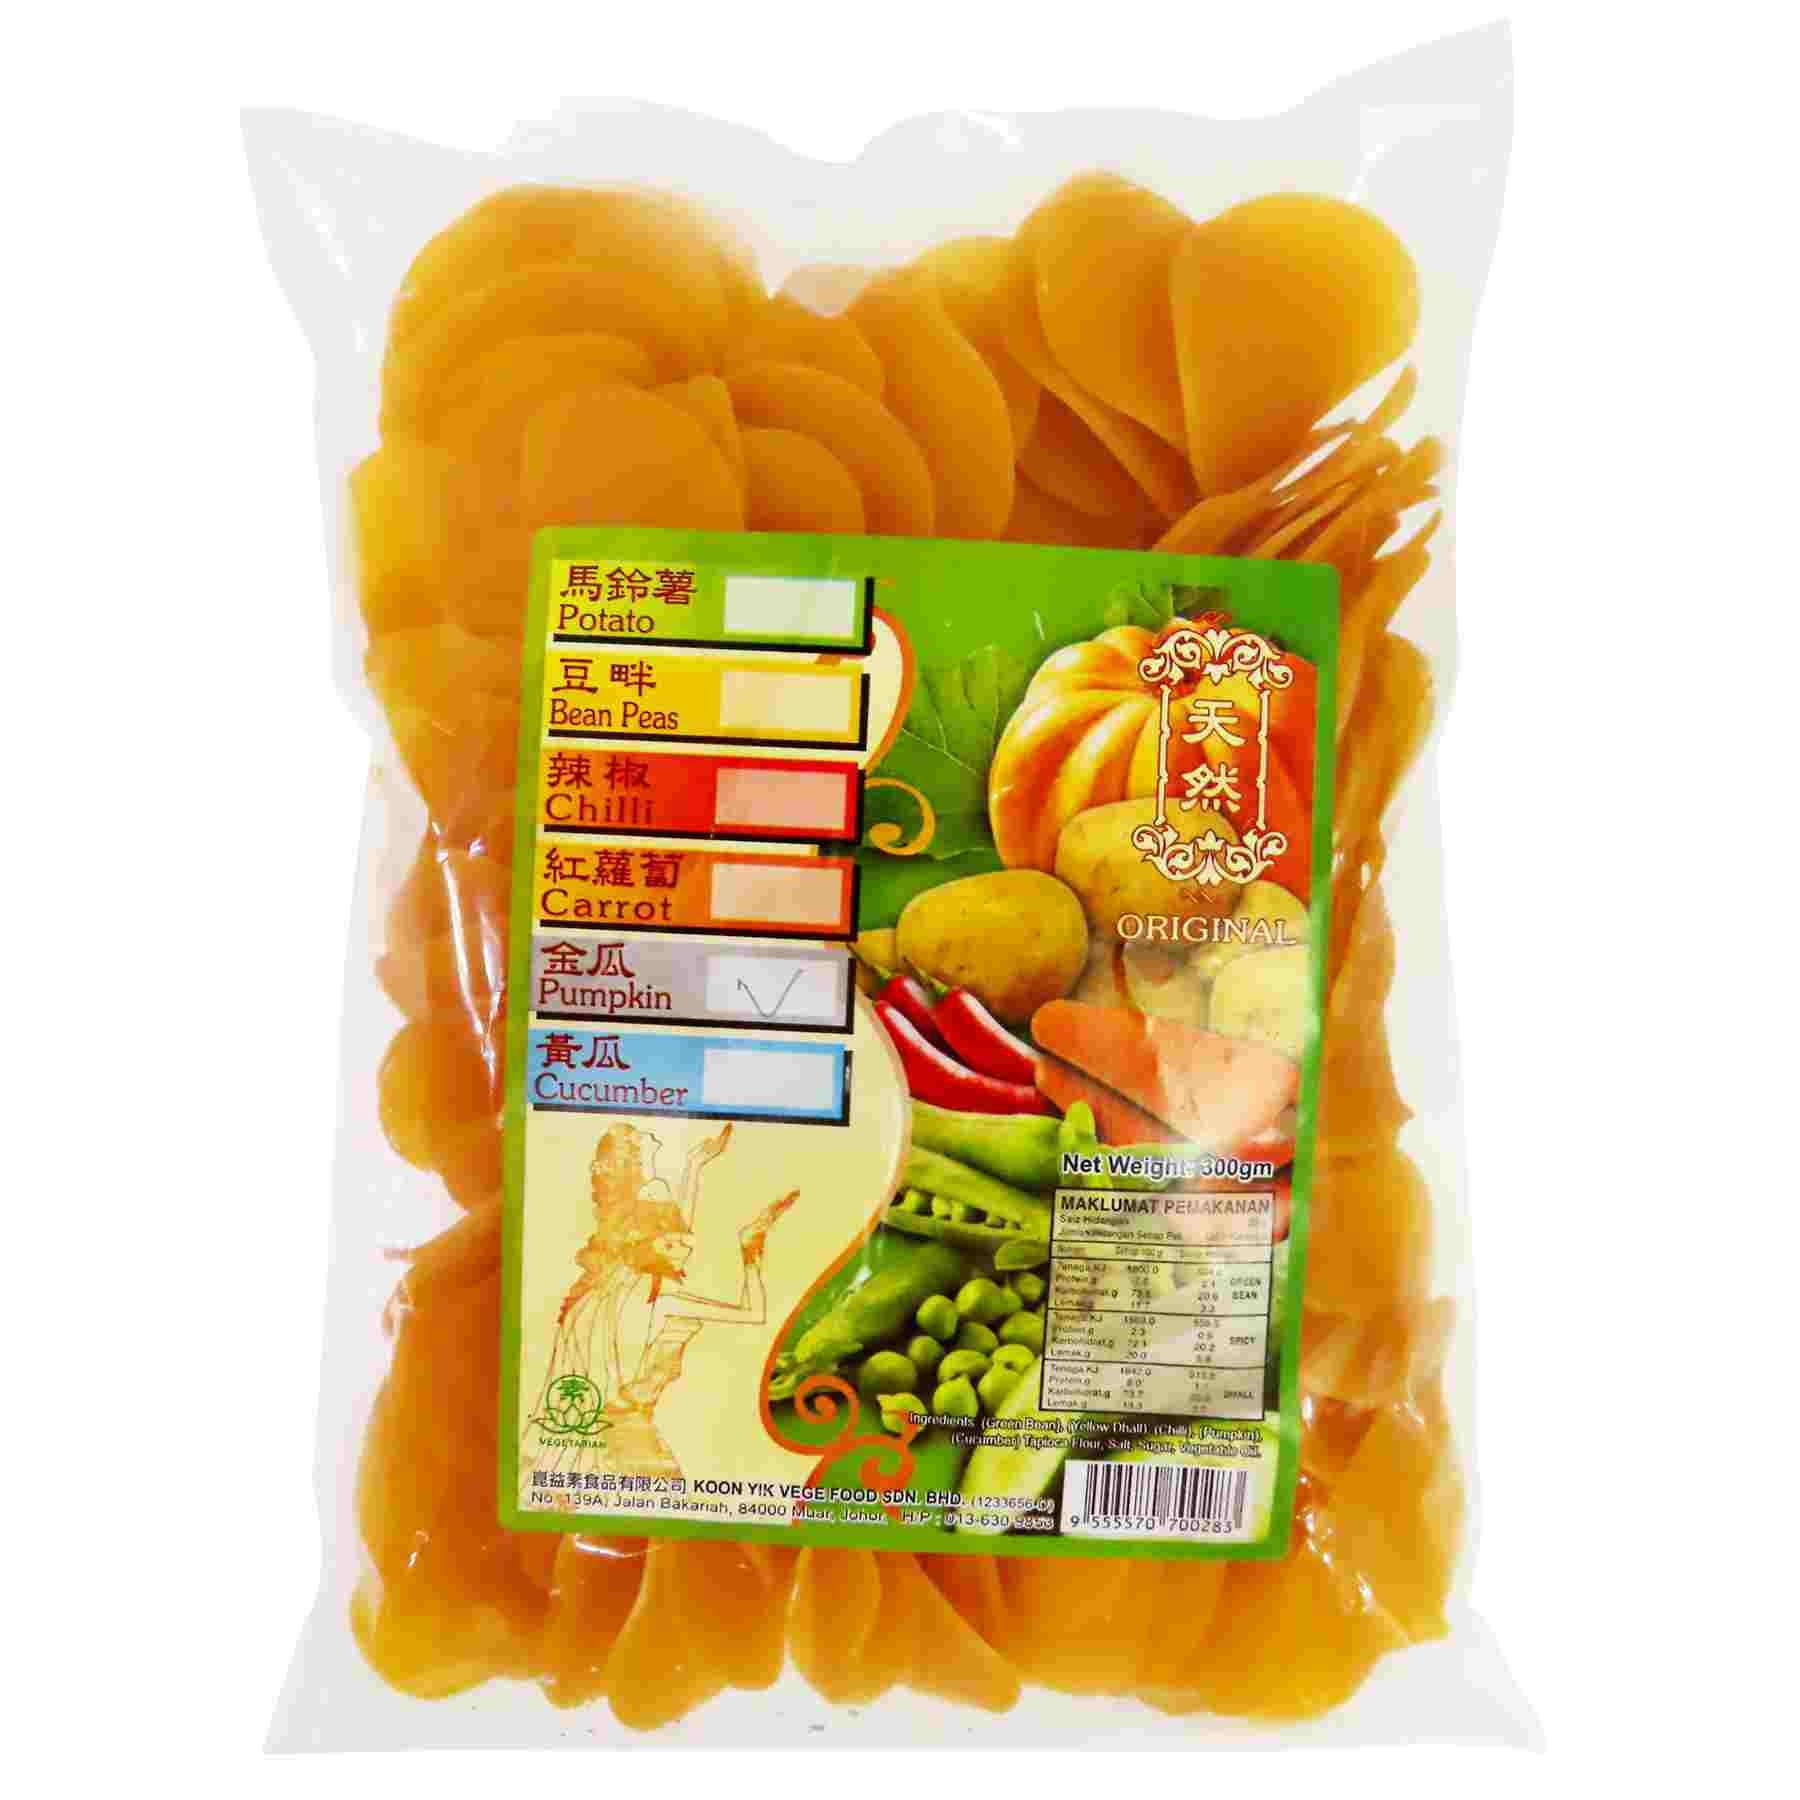 Image KY Original Pumpkin Crackers 昆益 - 天然金瓜生片 300grams